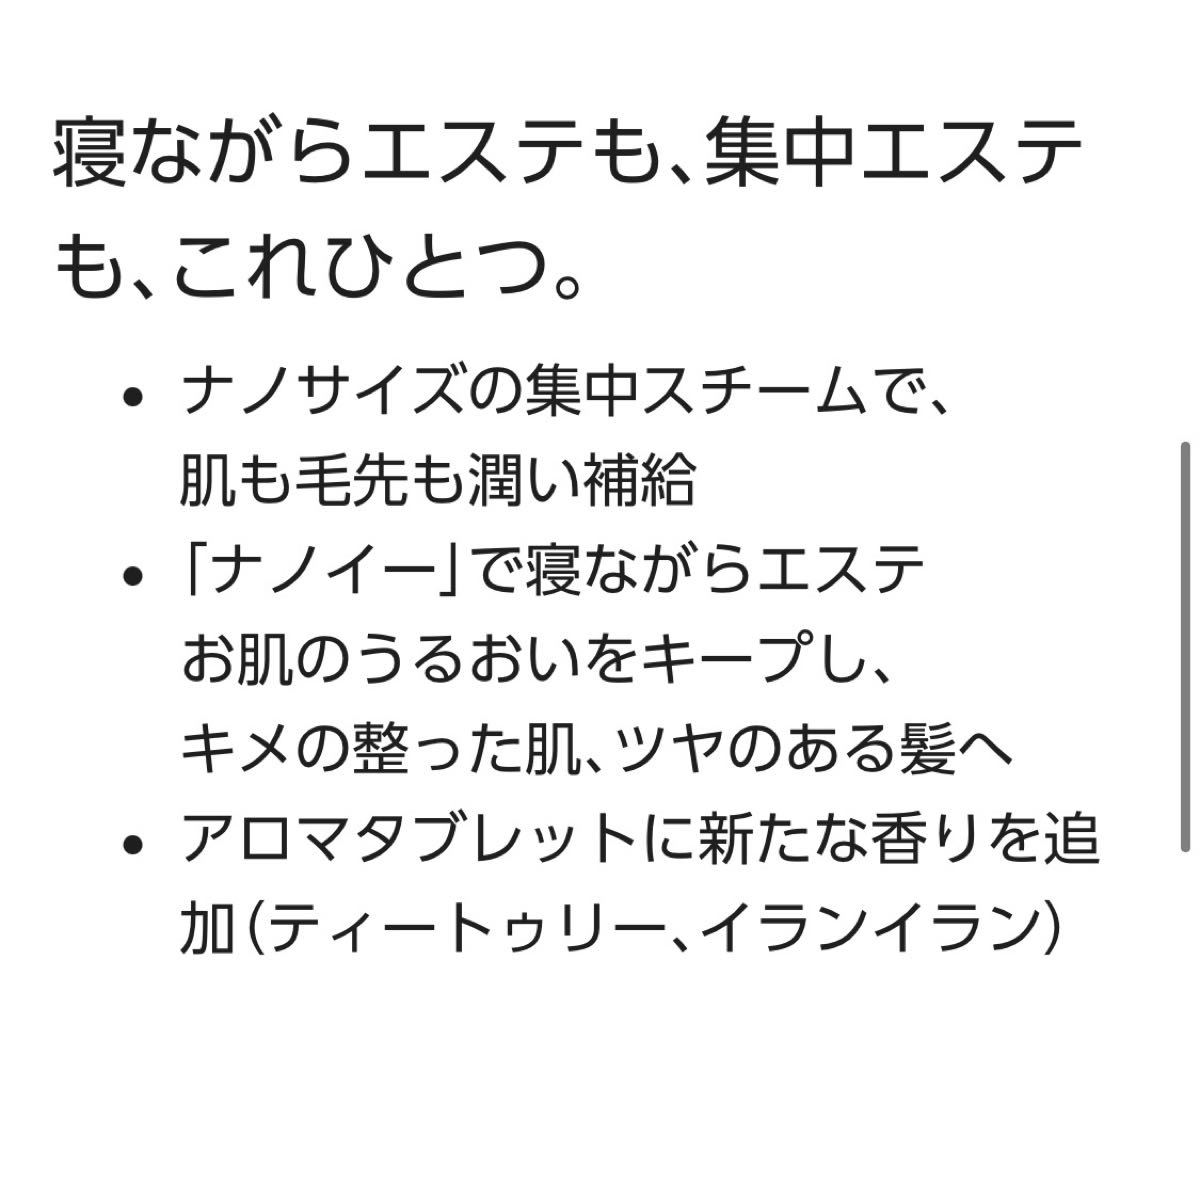 Panasonic スチーマー ナノケア 2Wayタイプ EH-SA67-P